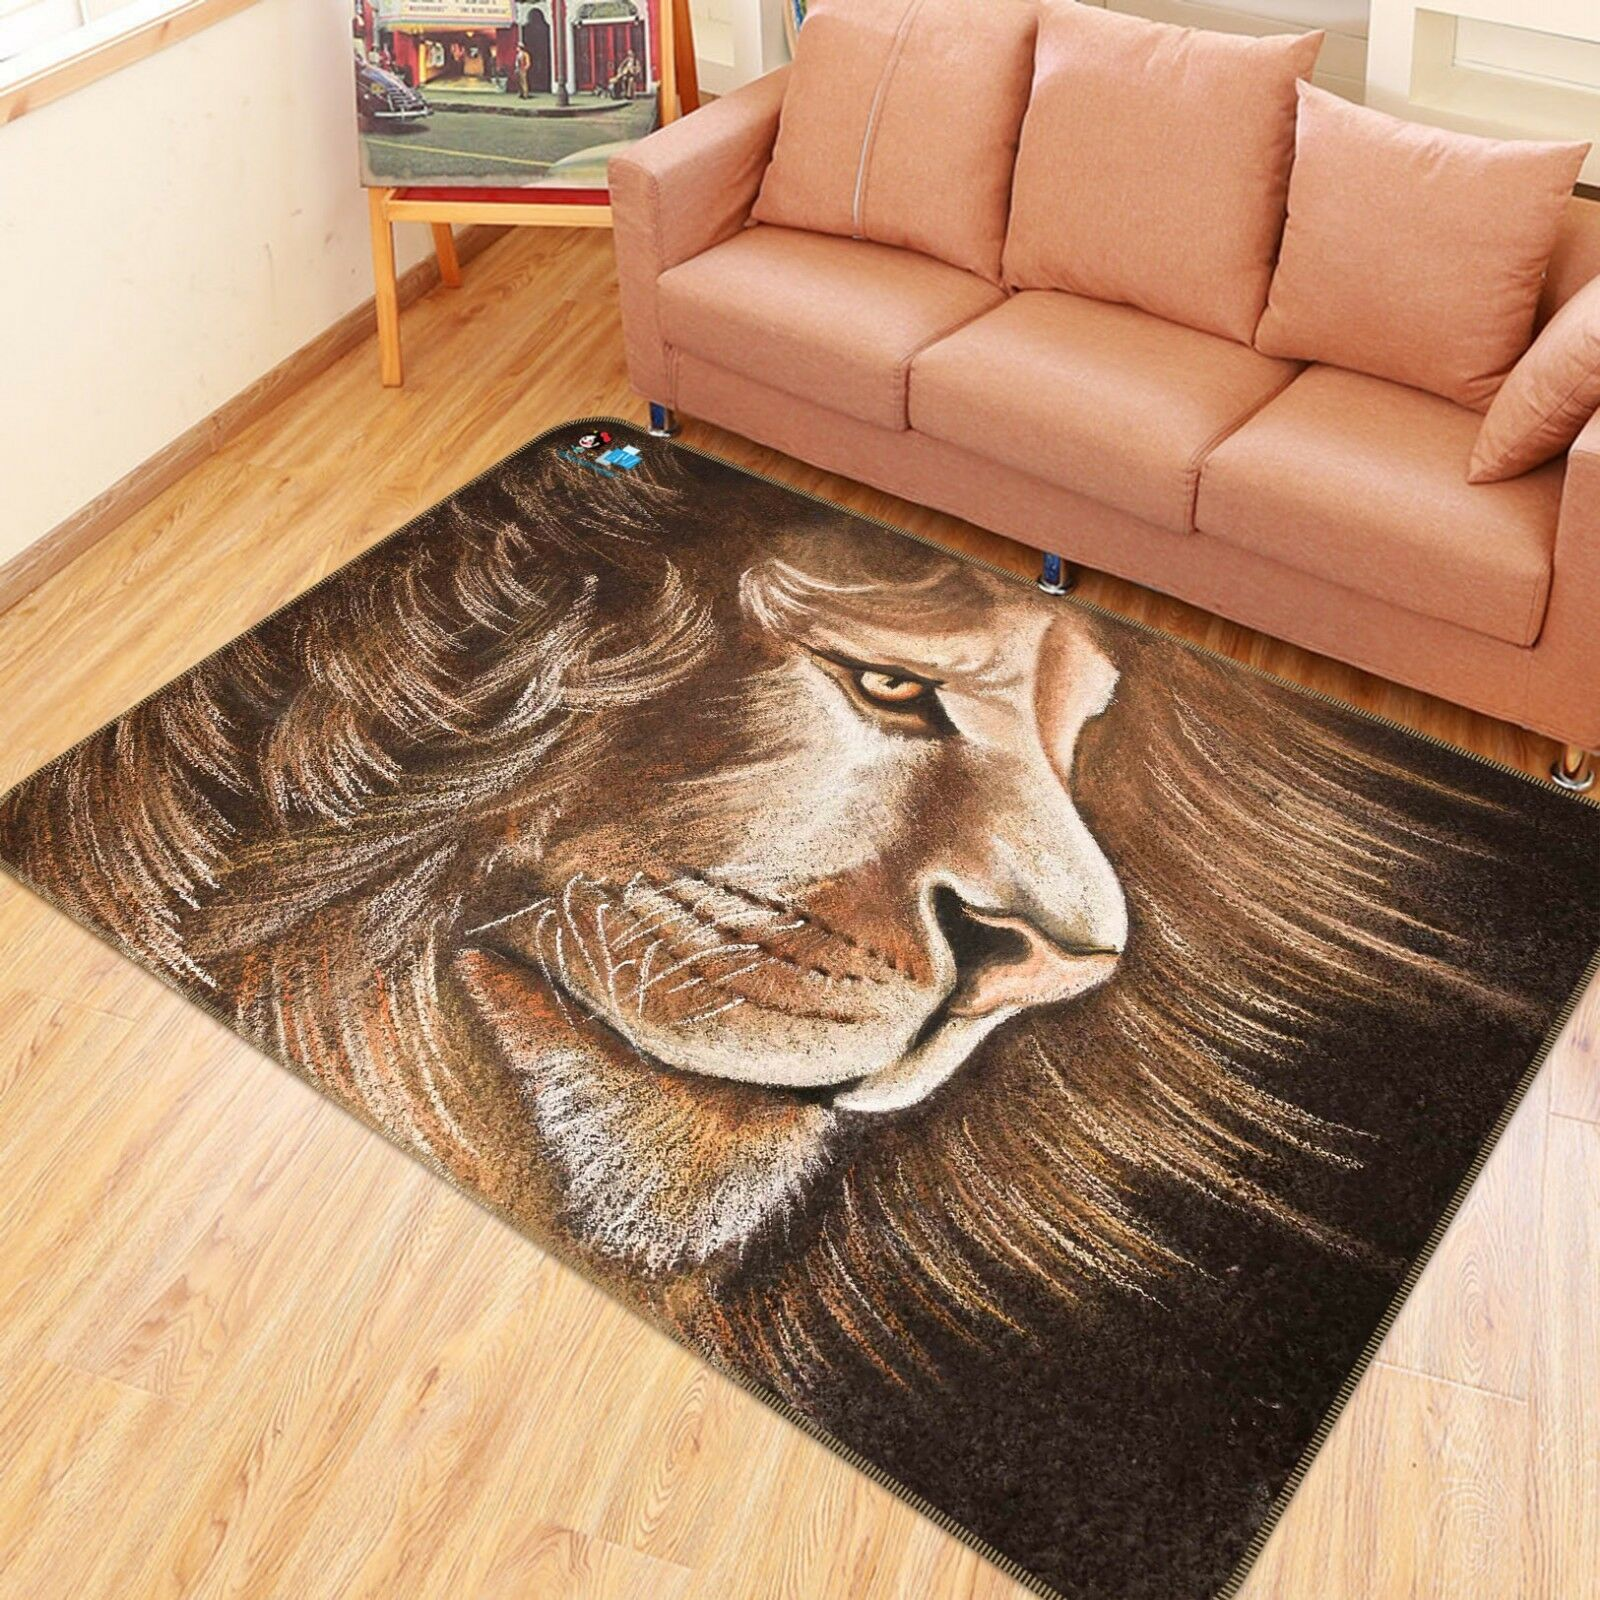 3D LION Texture 778 tappetino antiscivolo tappeto camera Tappetino Qualità Elegante foto Tappeto UK